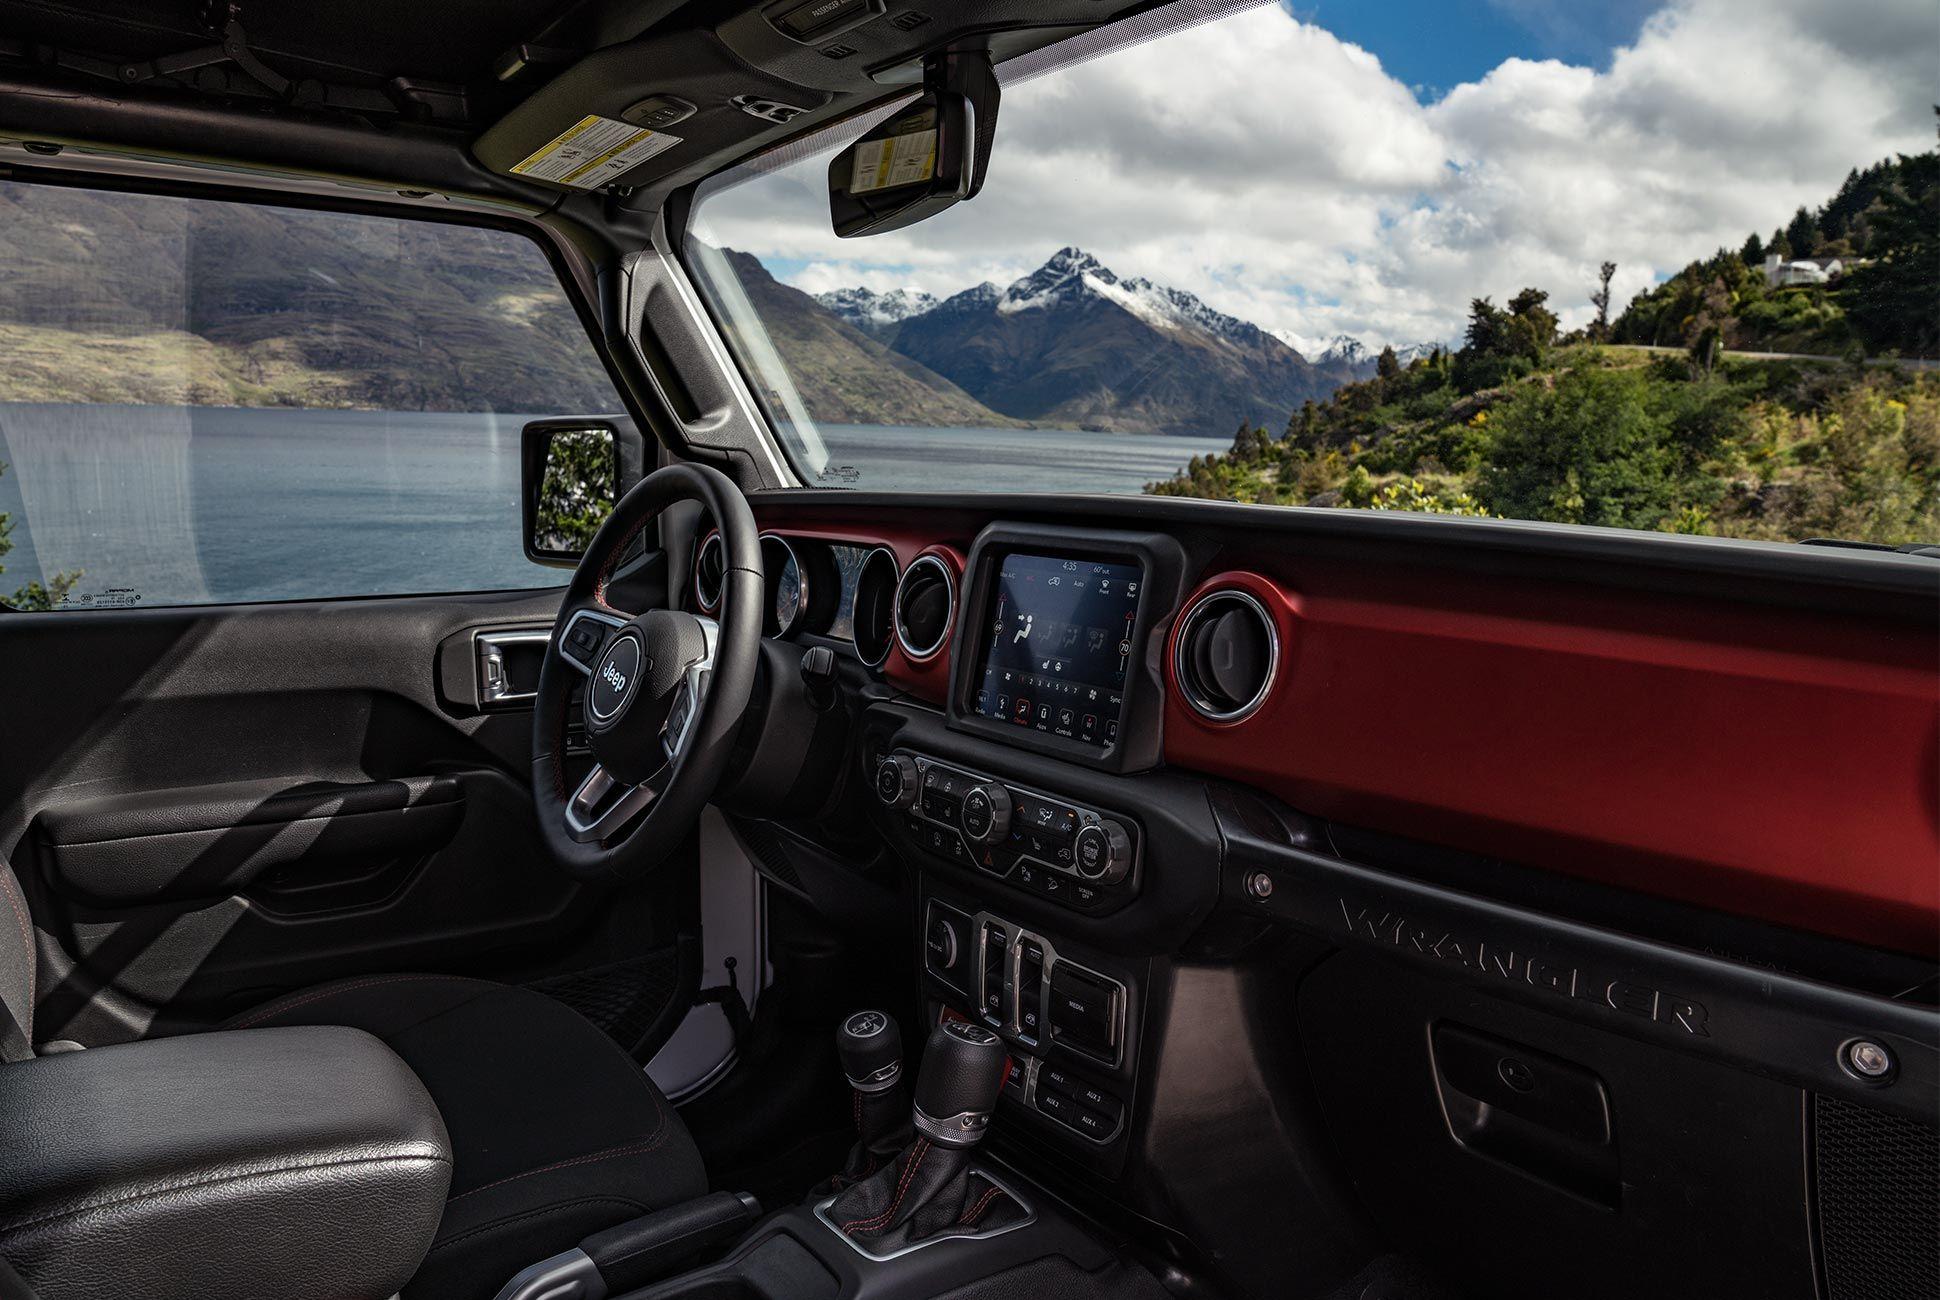 2018-Jeep-Wrangler-Review-gear-patrol-12